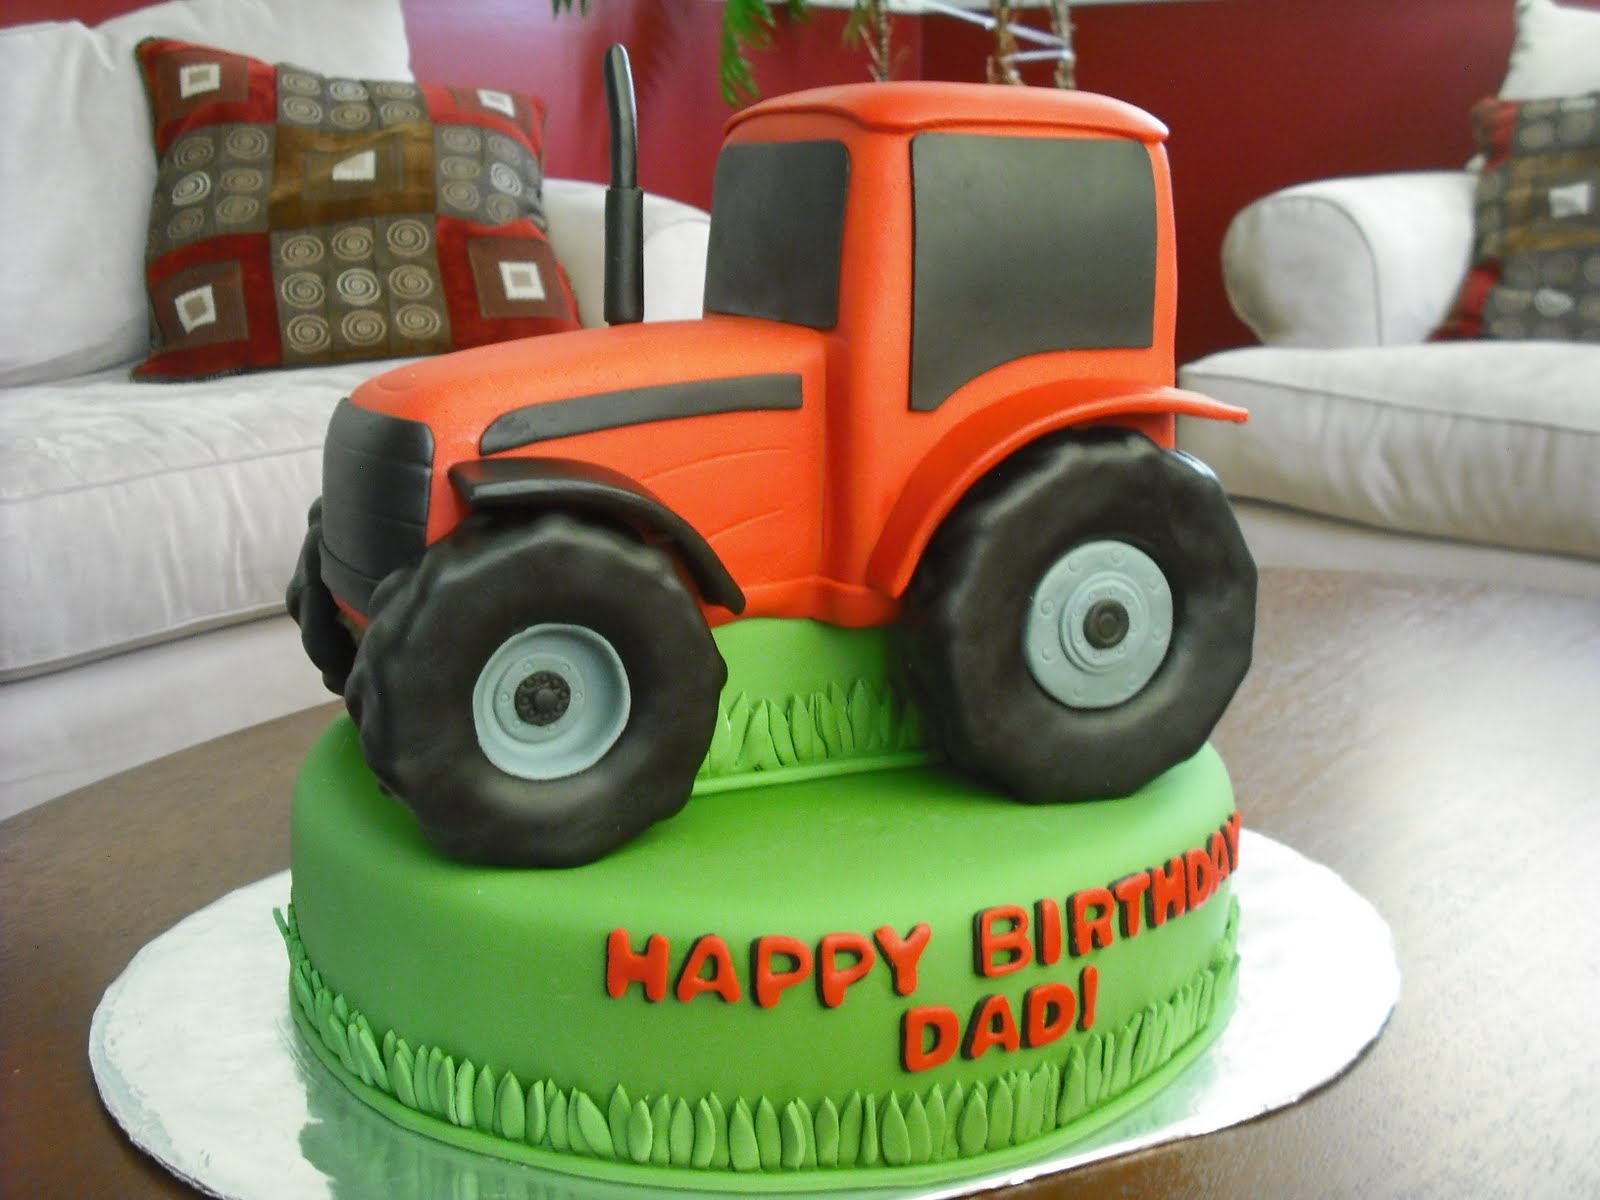 Ashleys Case Tractor